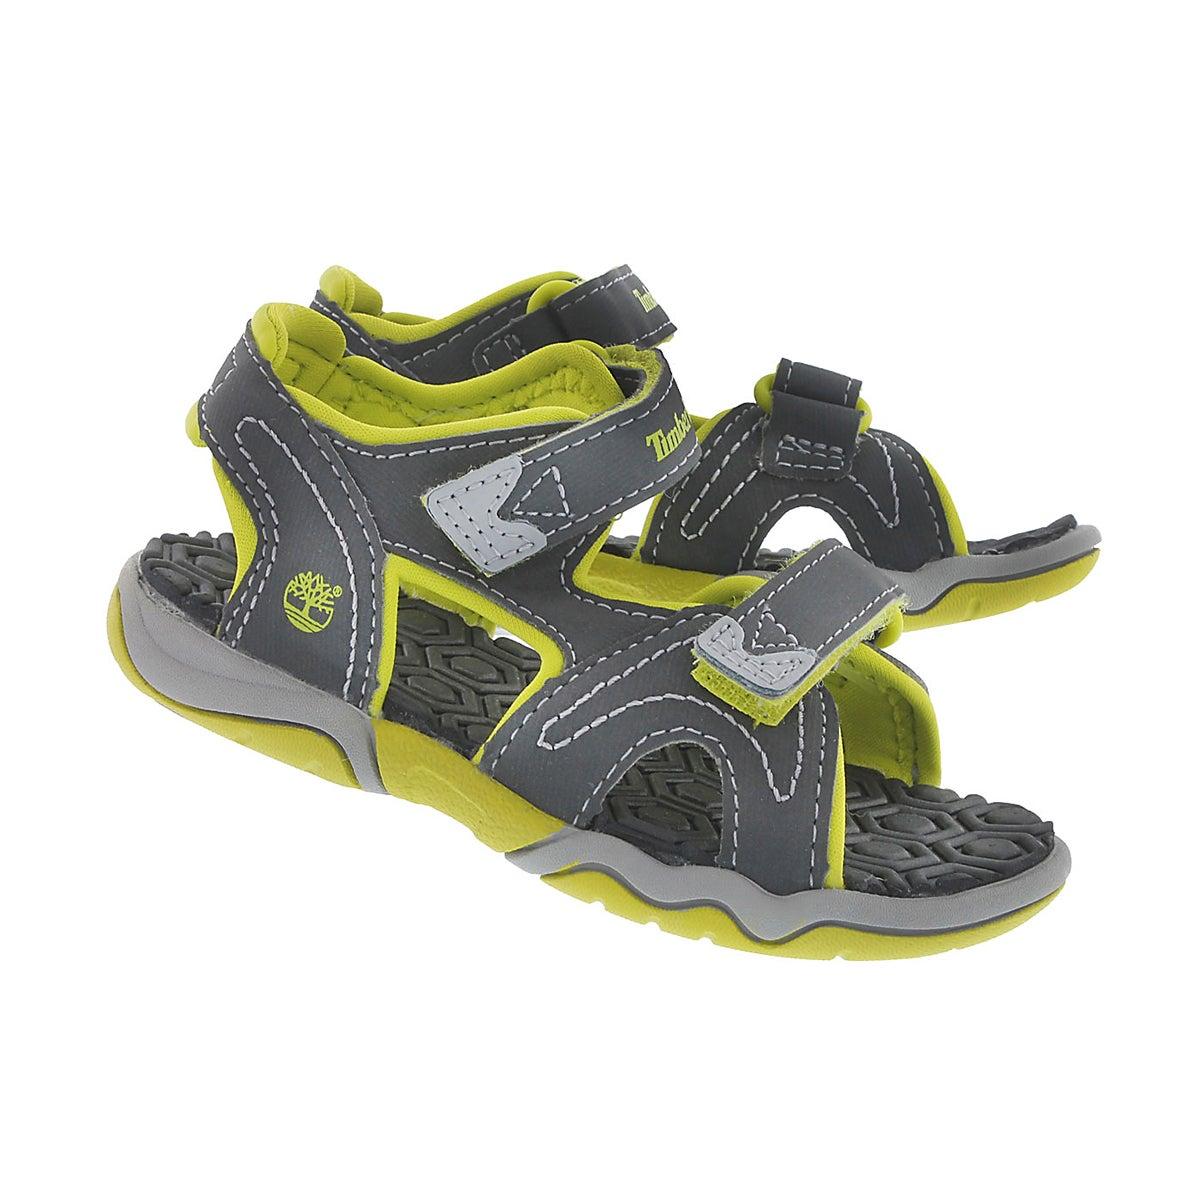 Sandale gris/vert ADVENTURE SEEKER, gar